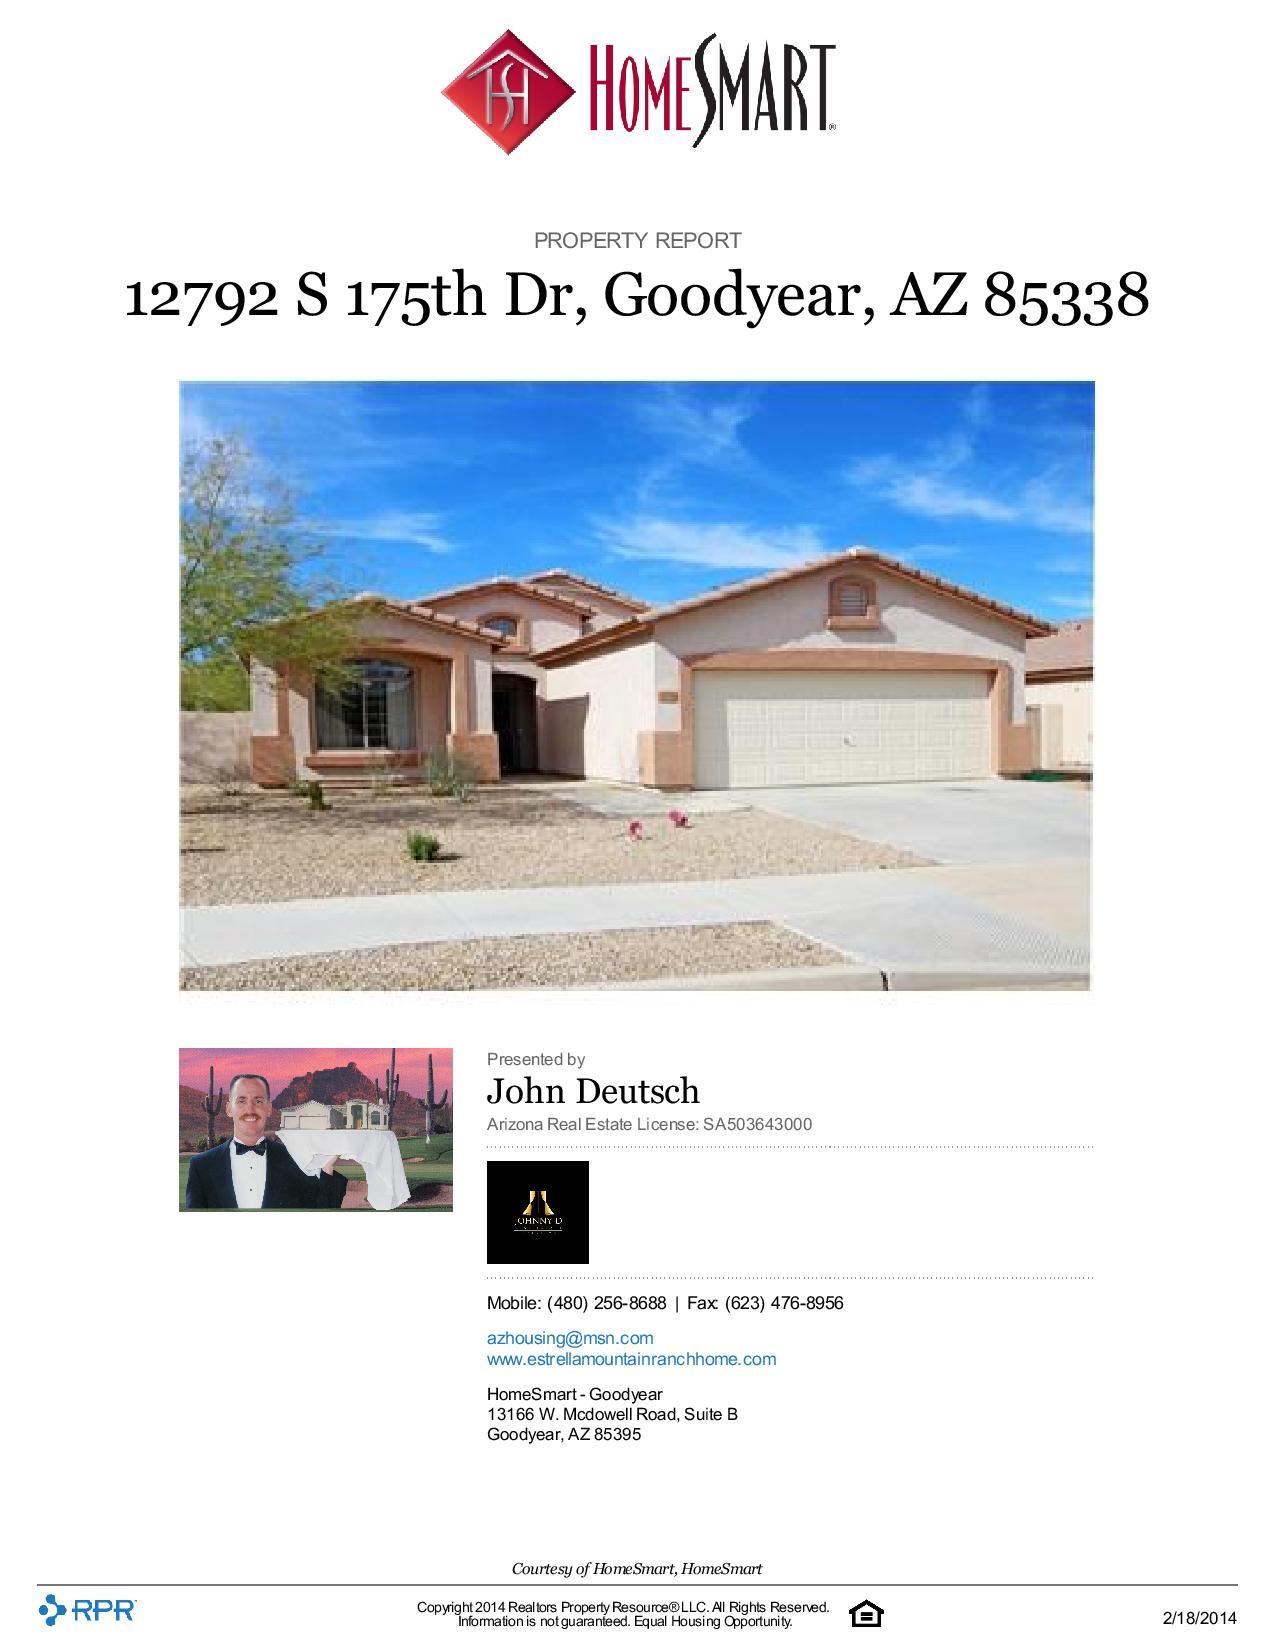 12792-S-175th-Dr-Goodyear-AZ-85338-page-001